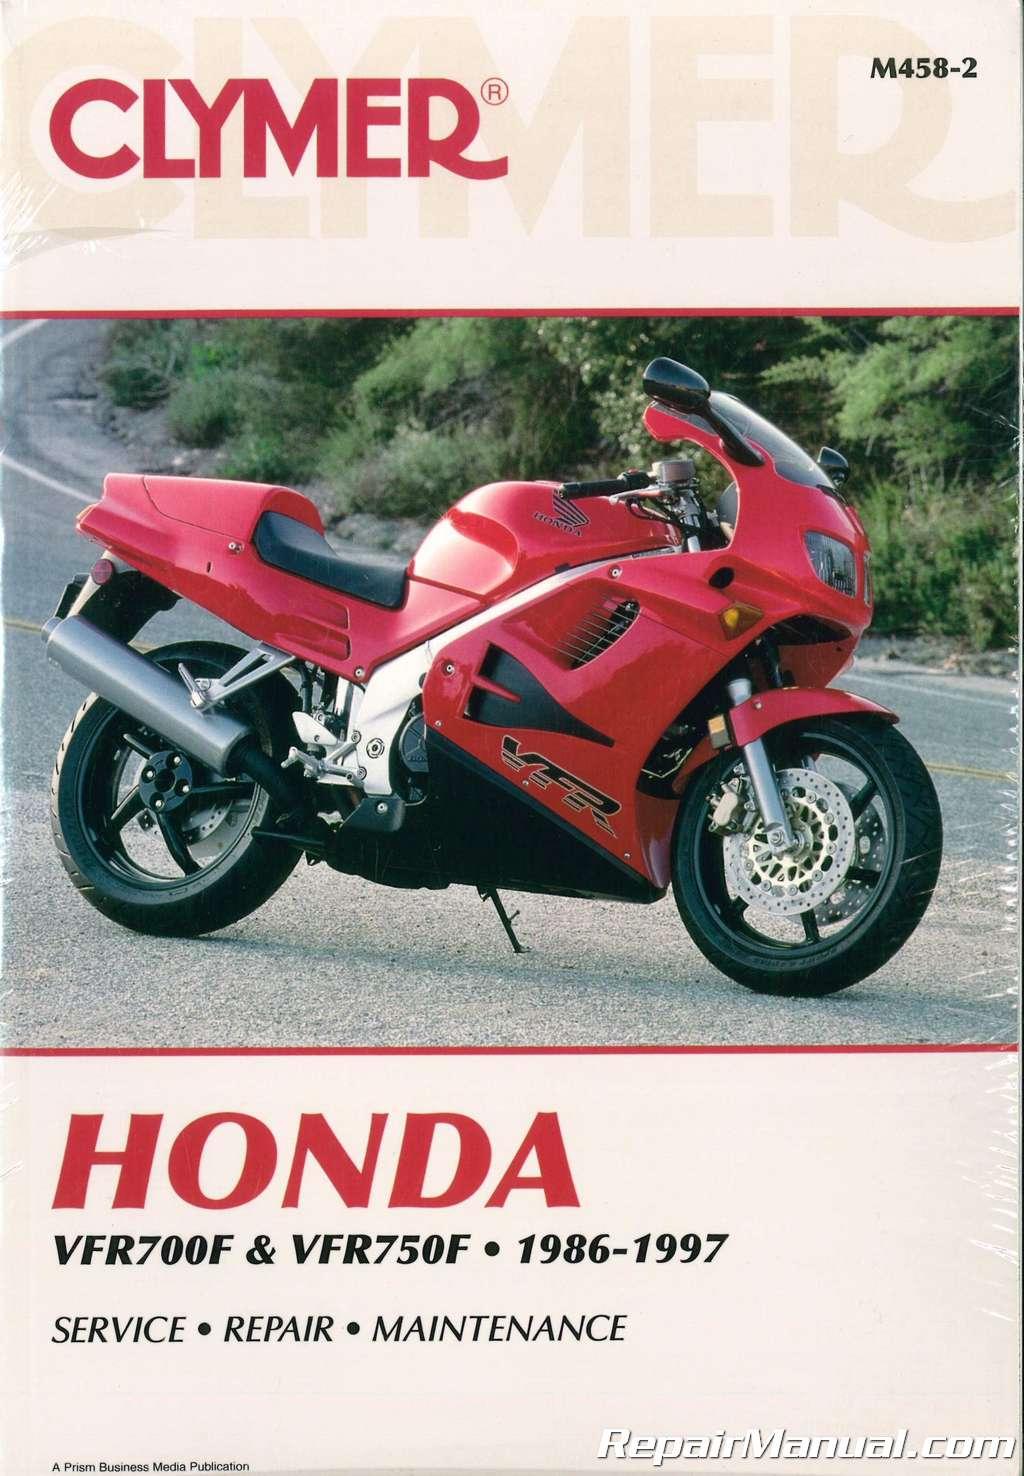 clymer honda vfr700f 750f 1986 1997 repair manual rh repairmanual com 1983 honda shadow vt500 manual honda shadow vt500 manual